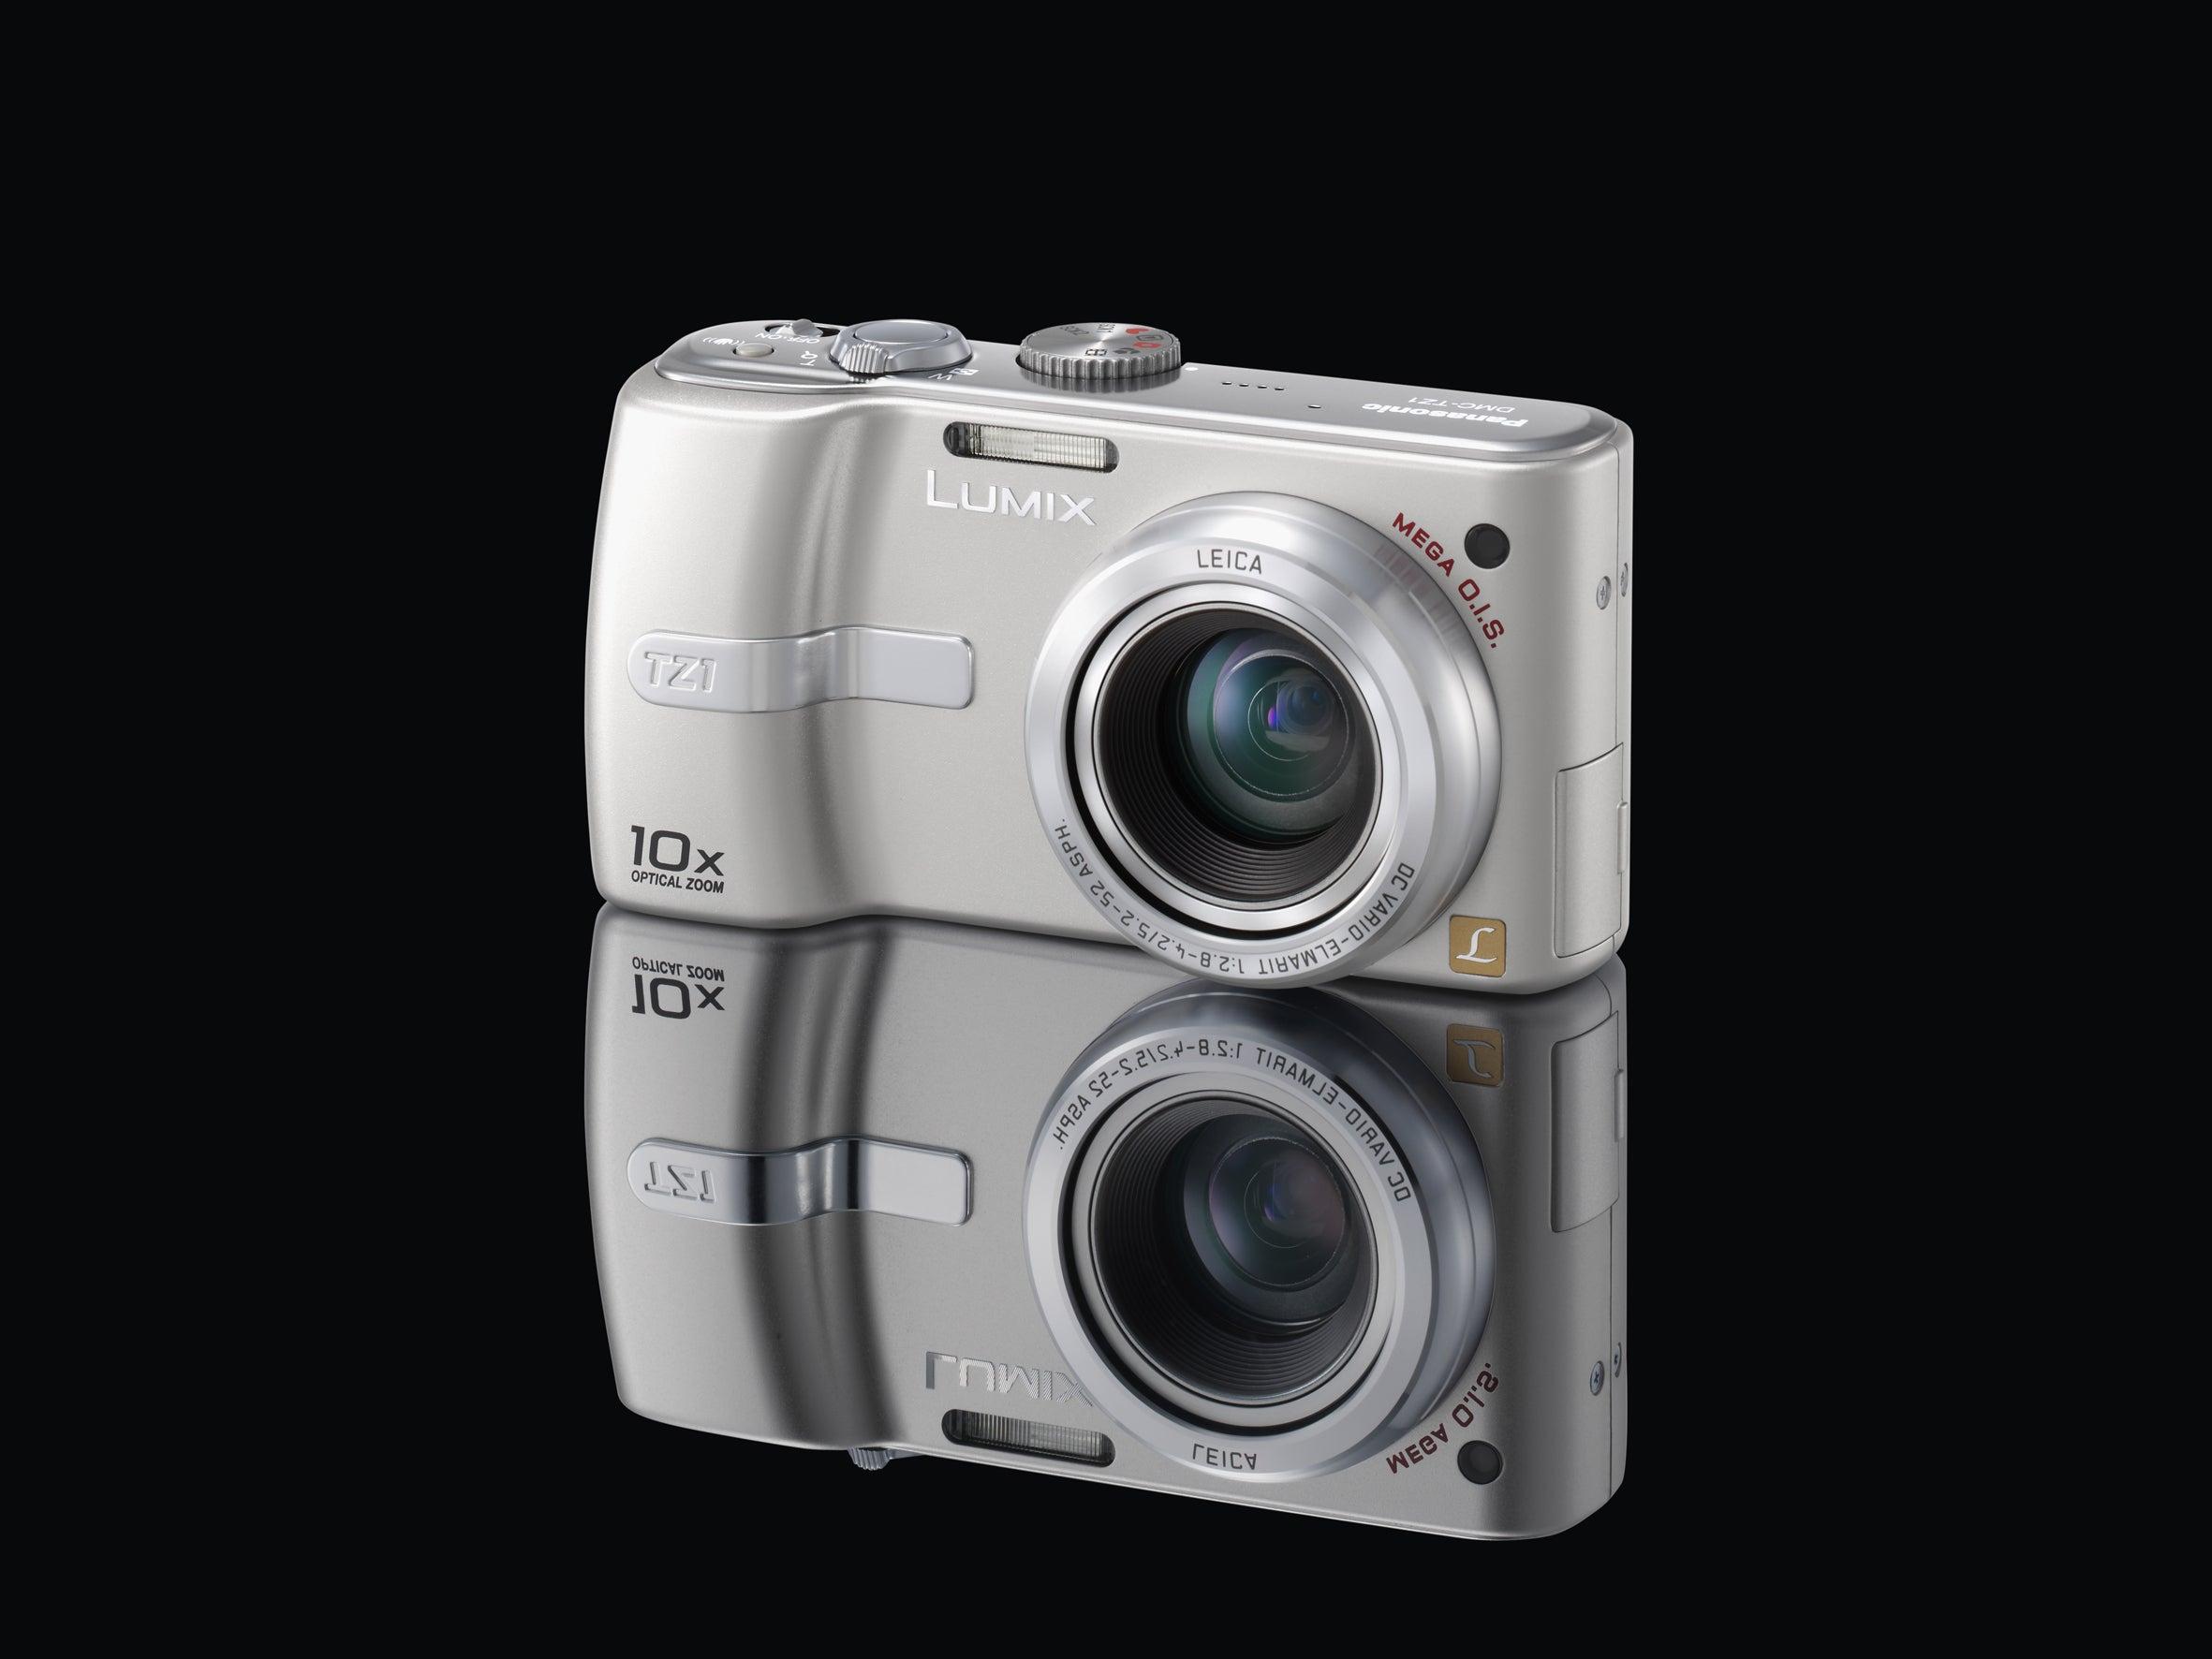 Panasonic Lumix DMC-TZ1 Review: Digital Photography Review